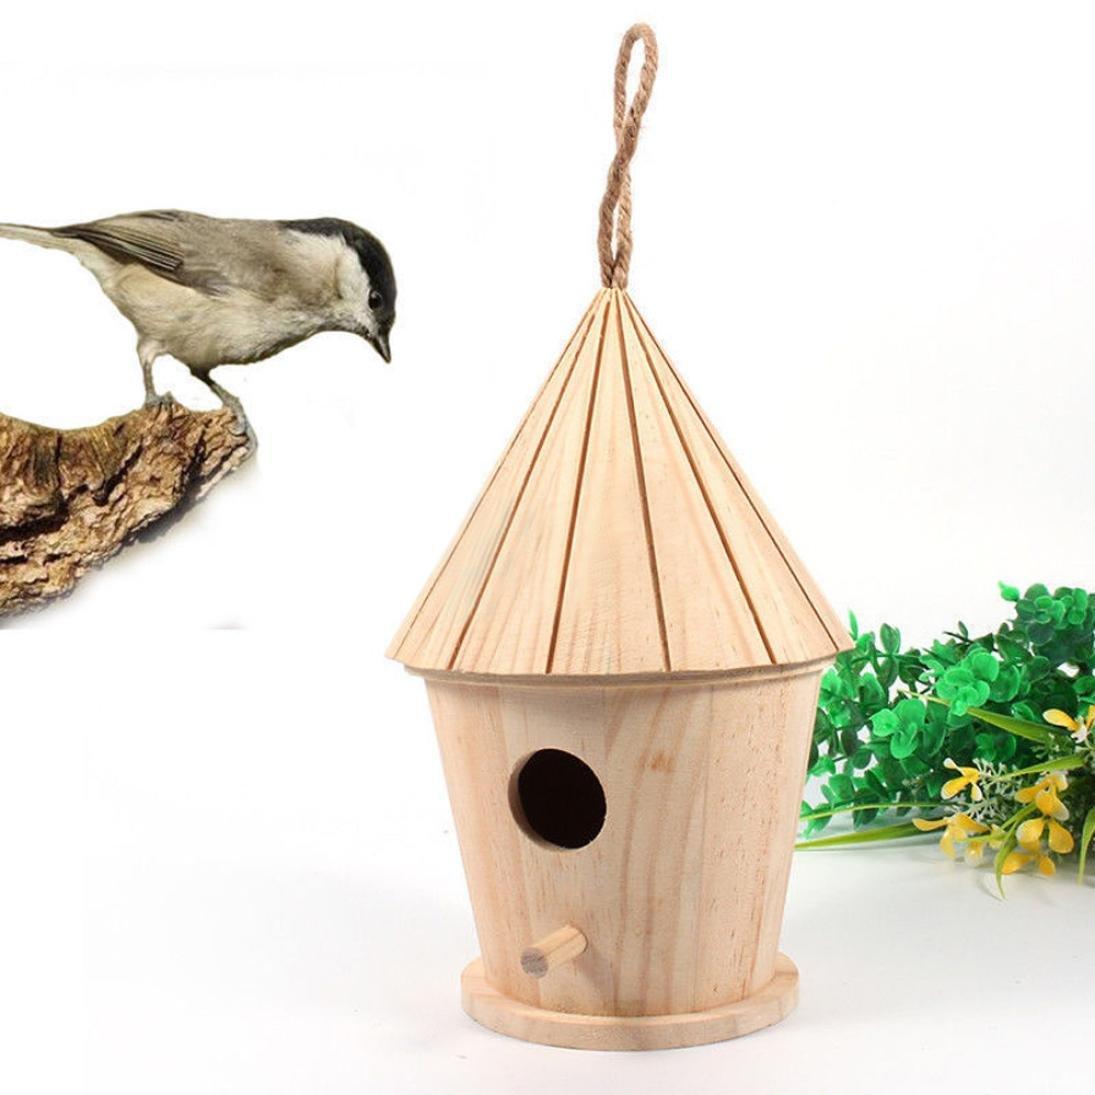 Nichoir en bois Mangeoire à oiseaux (A 14x8.5cm) Ouneed